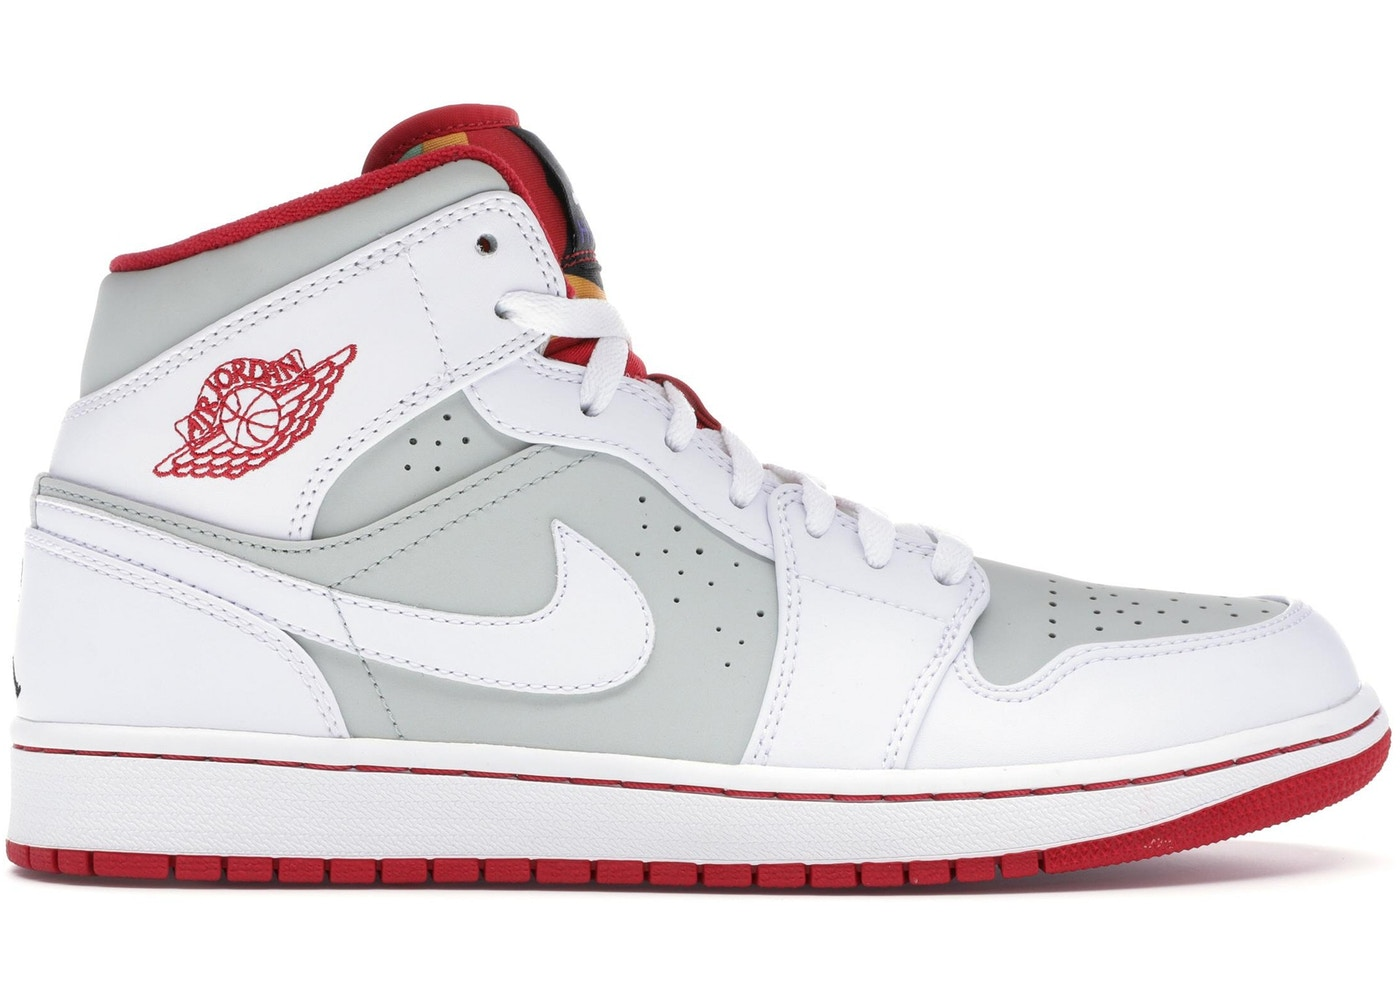 90cabac160e Jordan 1 Retro Hare Jordan (2015) - 719551-123